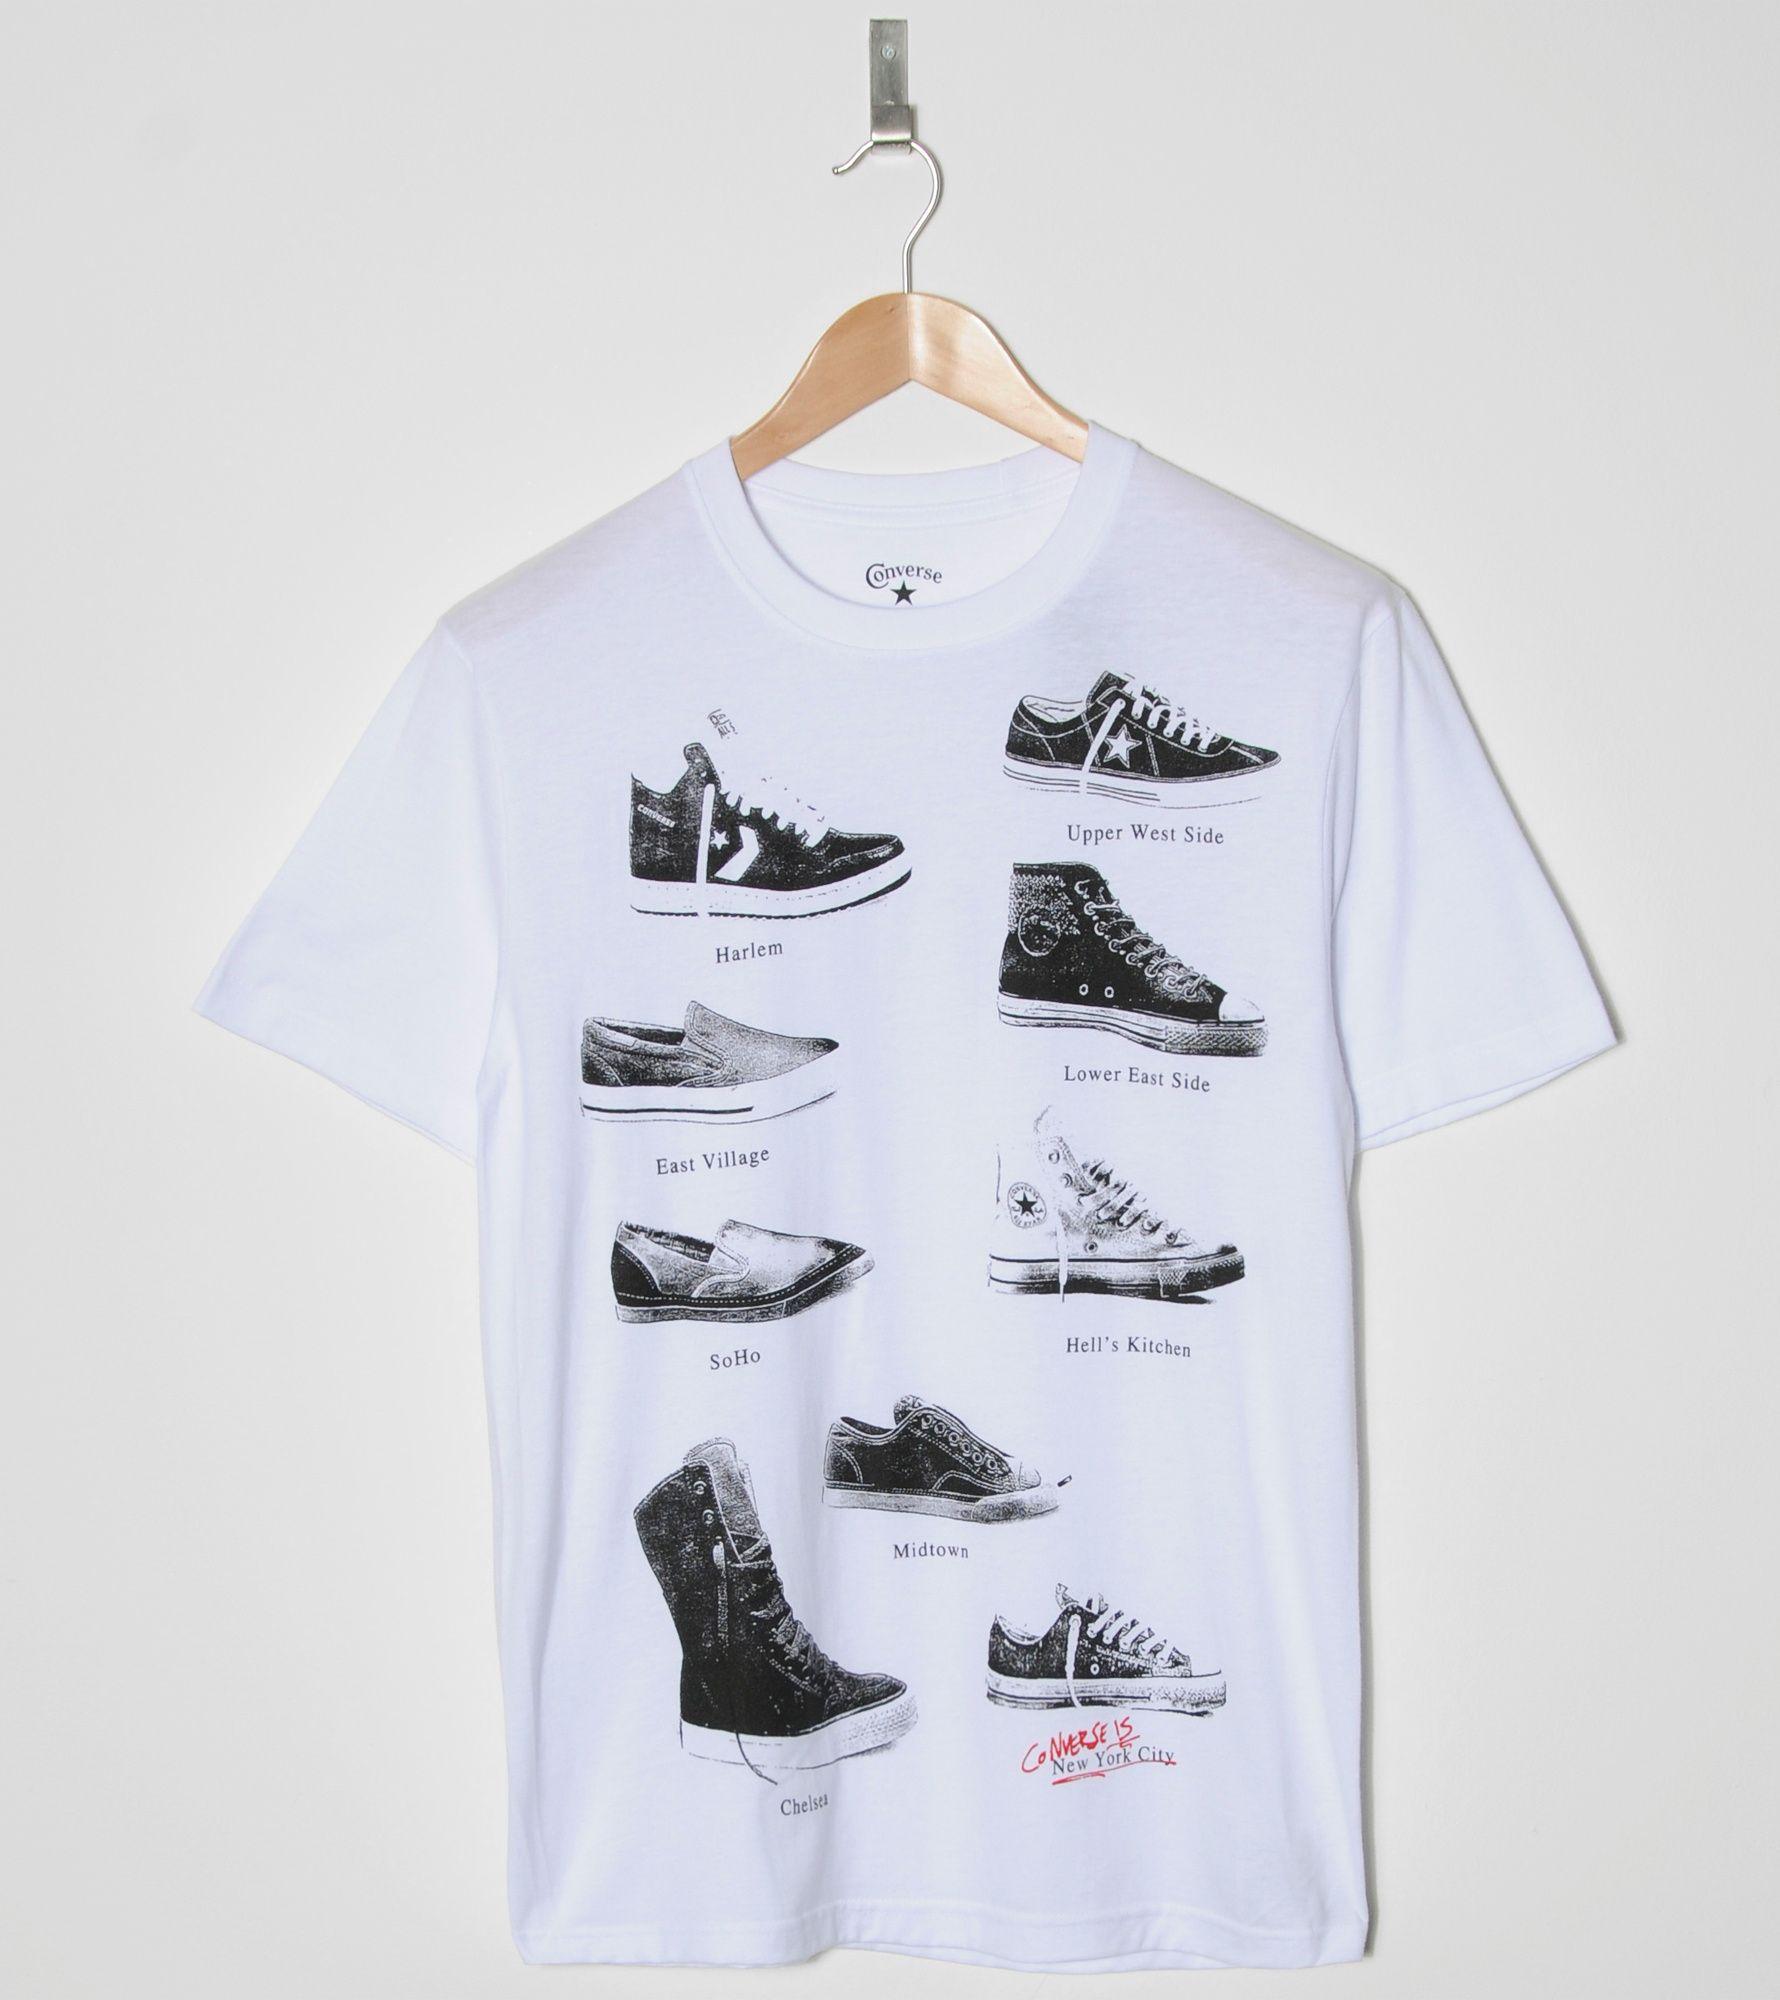 8cce0541f26d34 Converse Shoes T-Shirt